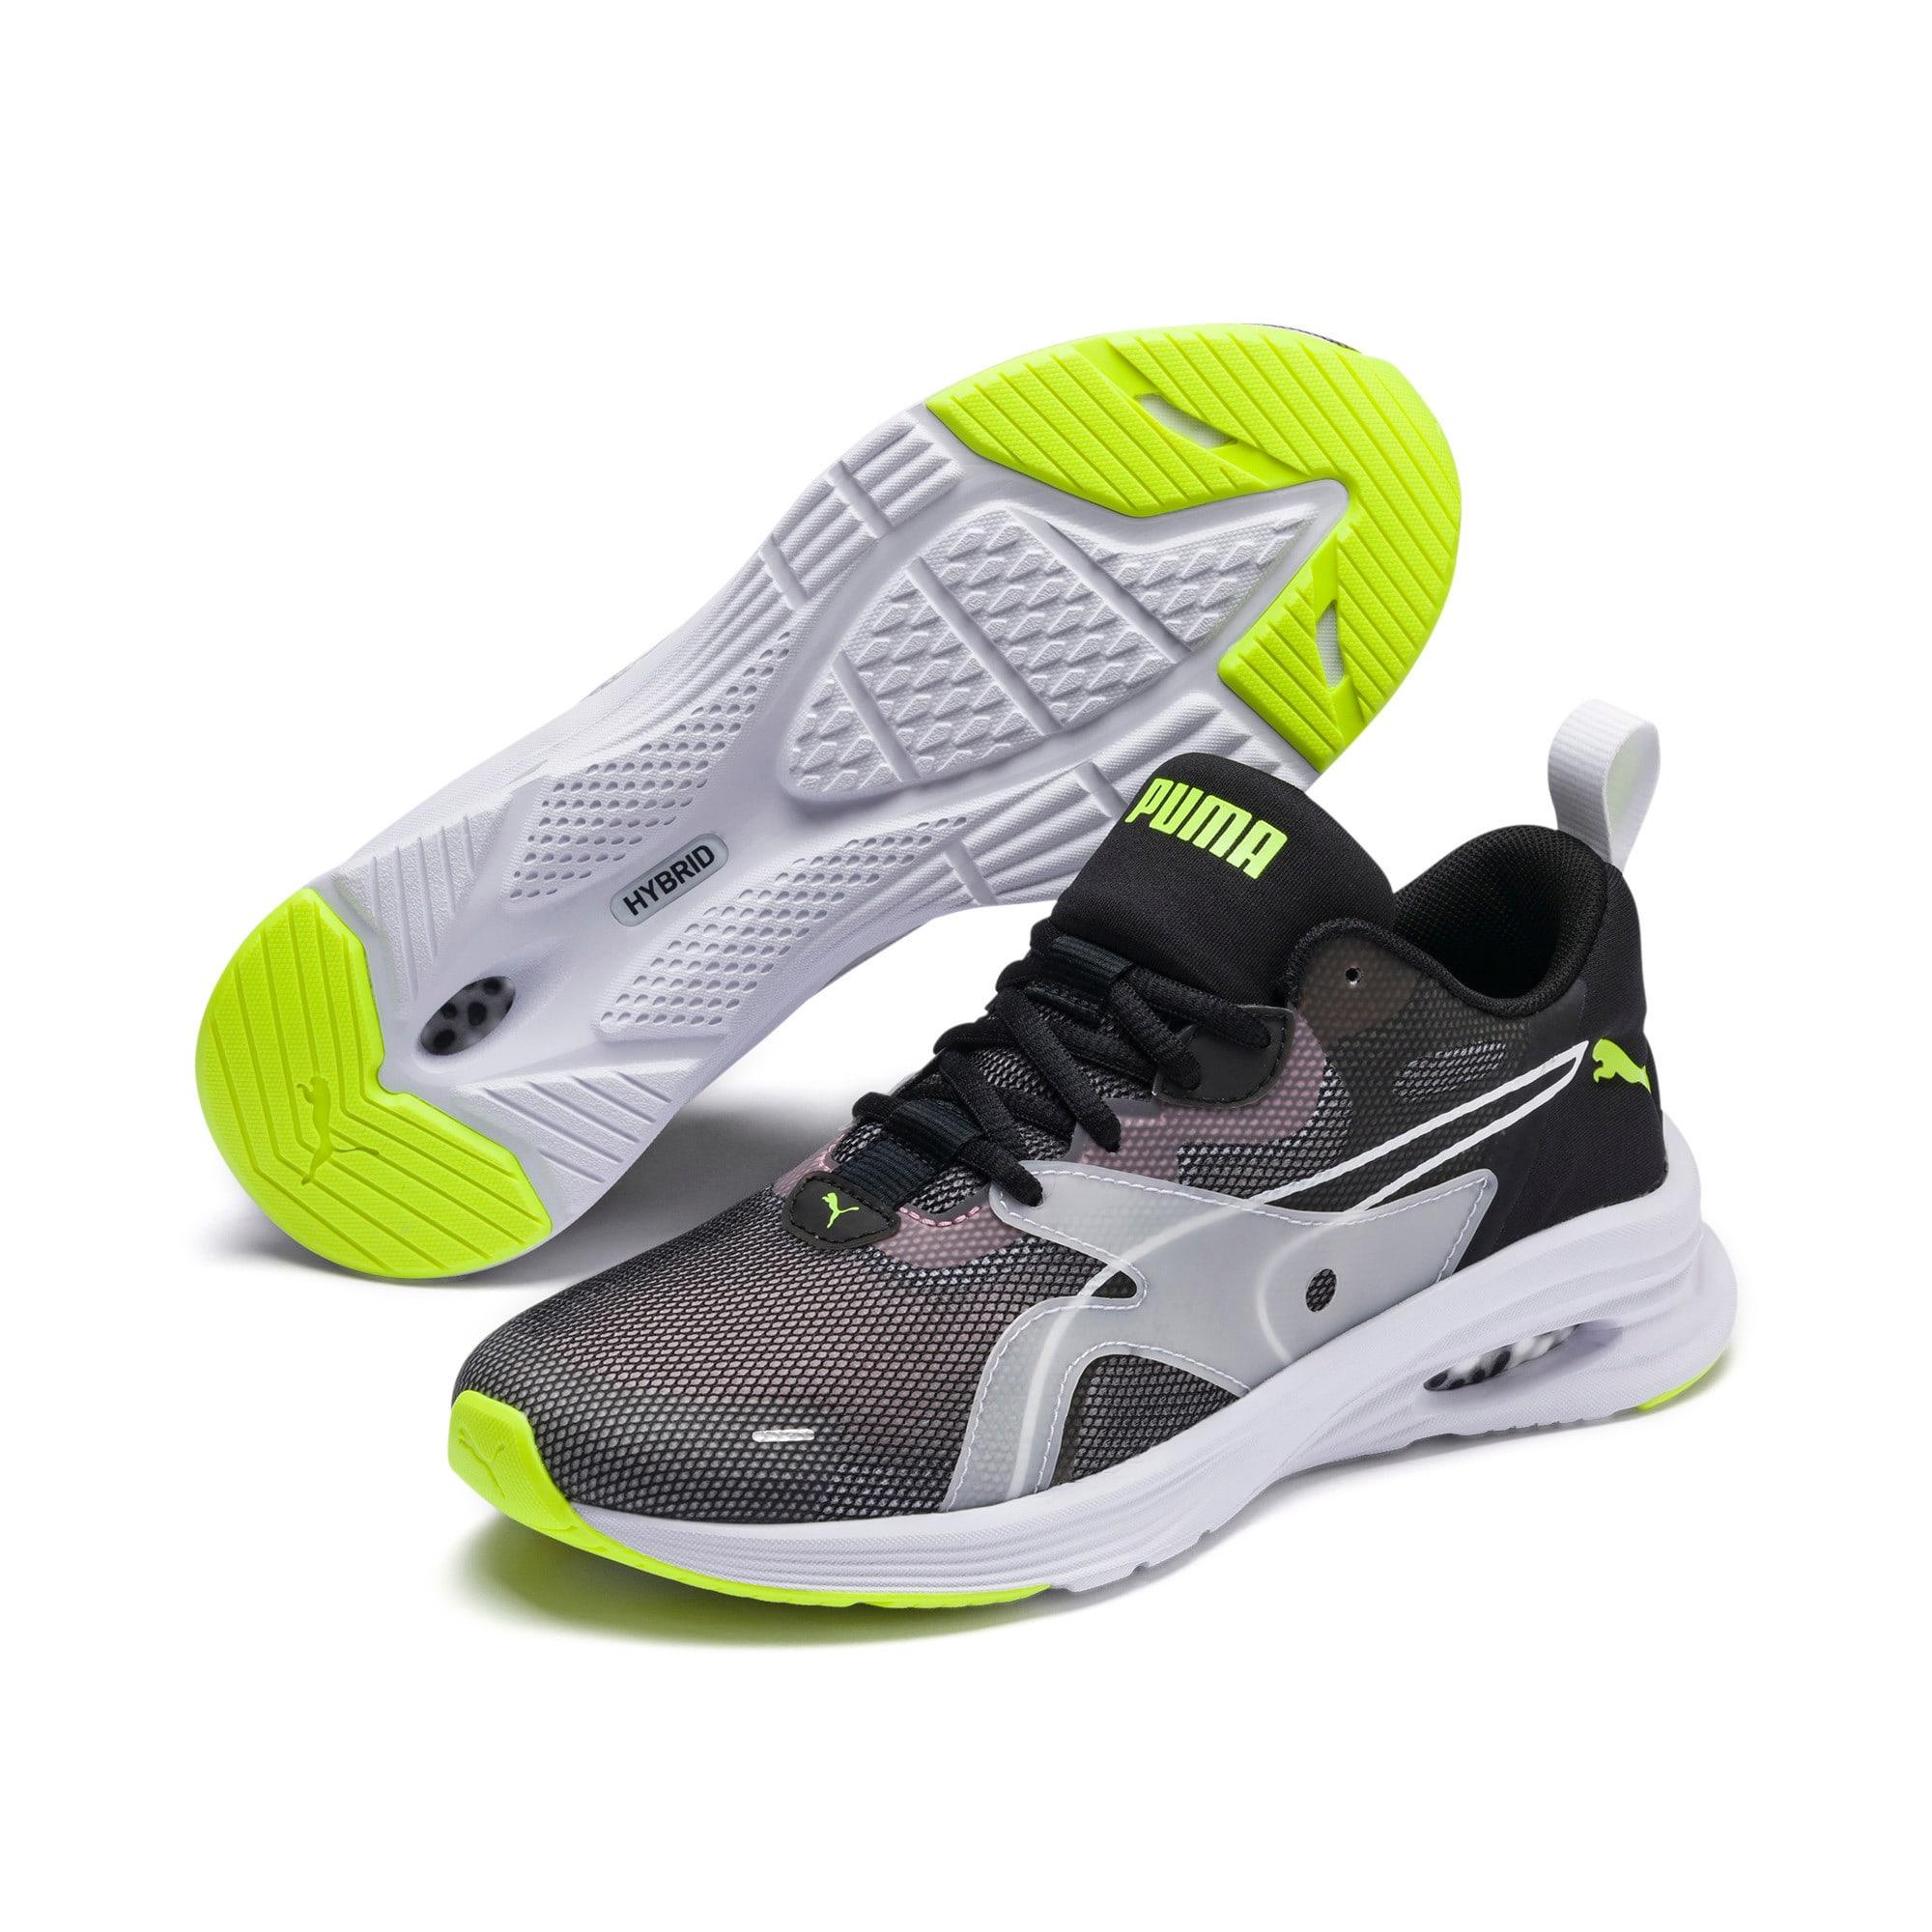 Thumbnail 2 of HYBRID Fuego Shift Women's Running Shoes, Puma Black-Bridal Rose, medium